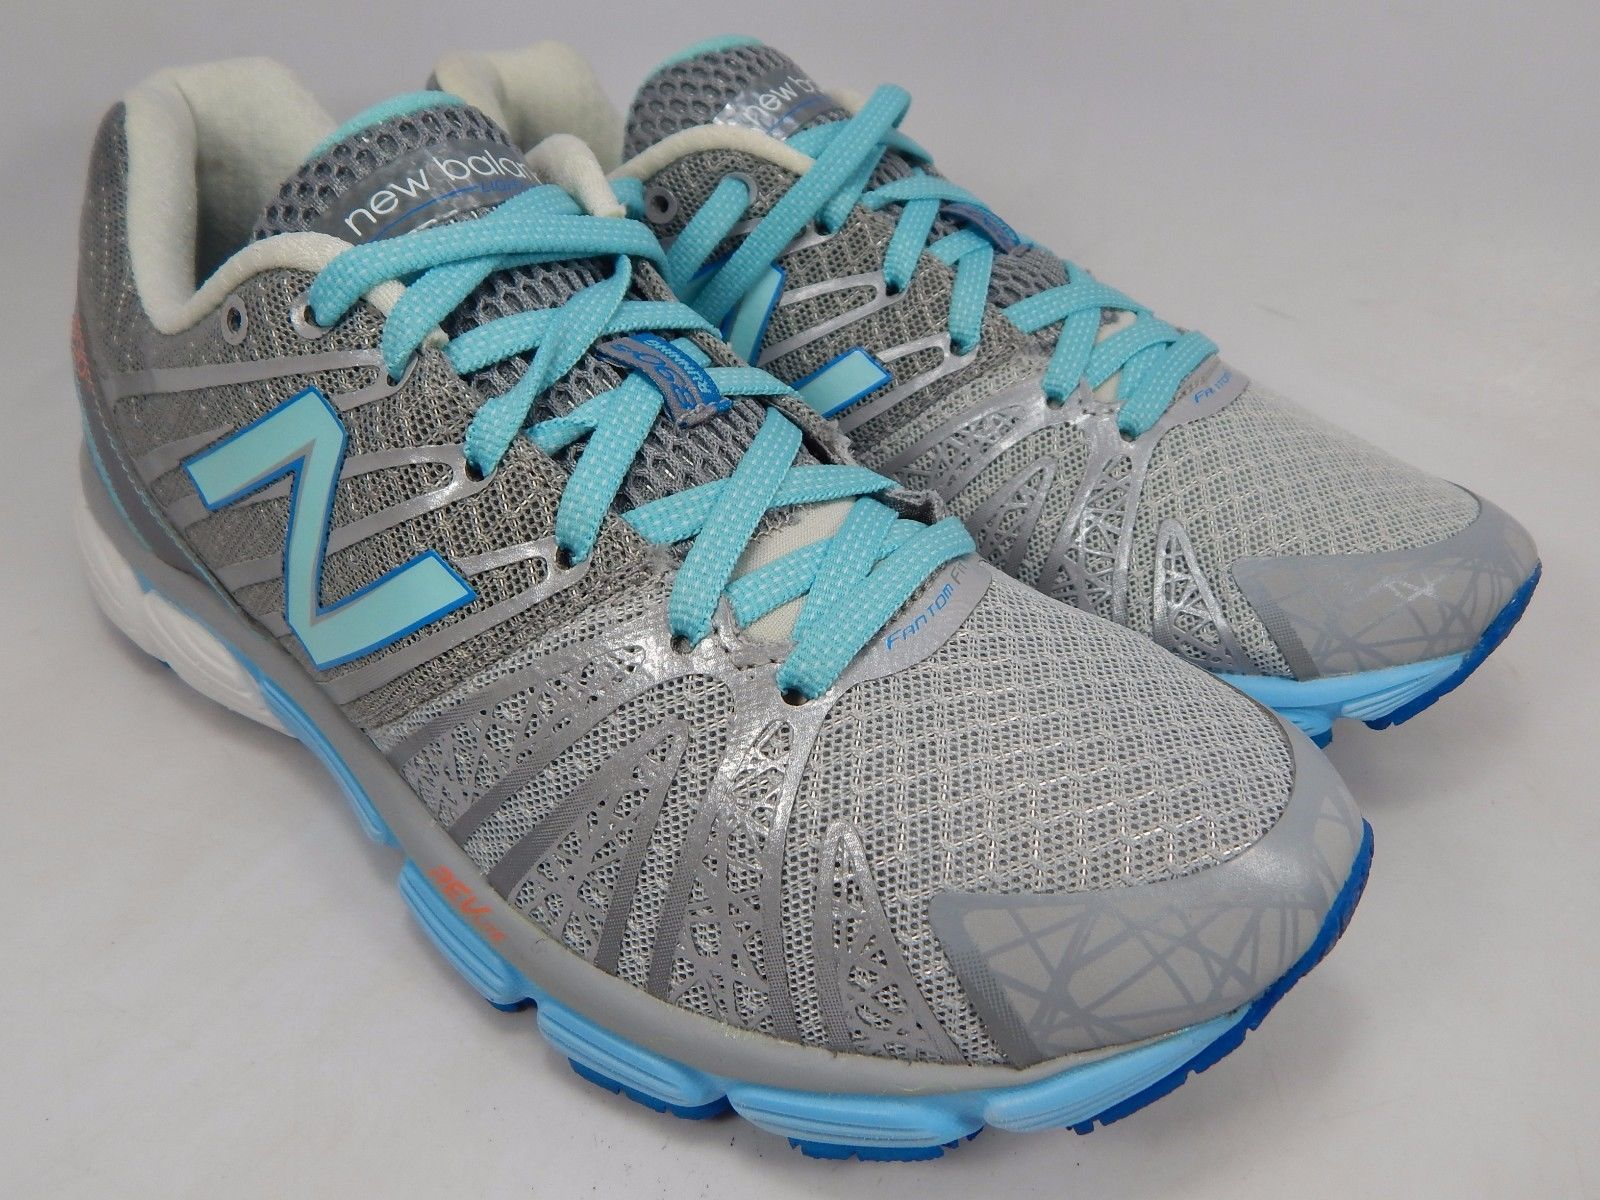 new style ced37 71d67 New Balance 890 v5 Women s Running Shoes Size US 8 M (B) EU 39 ...